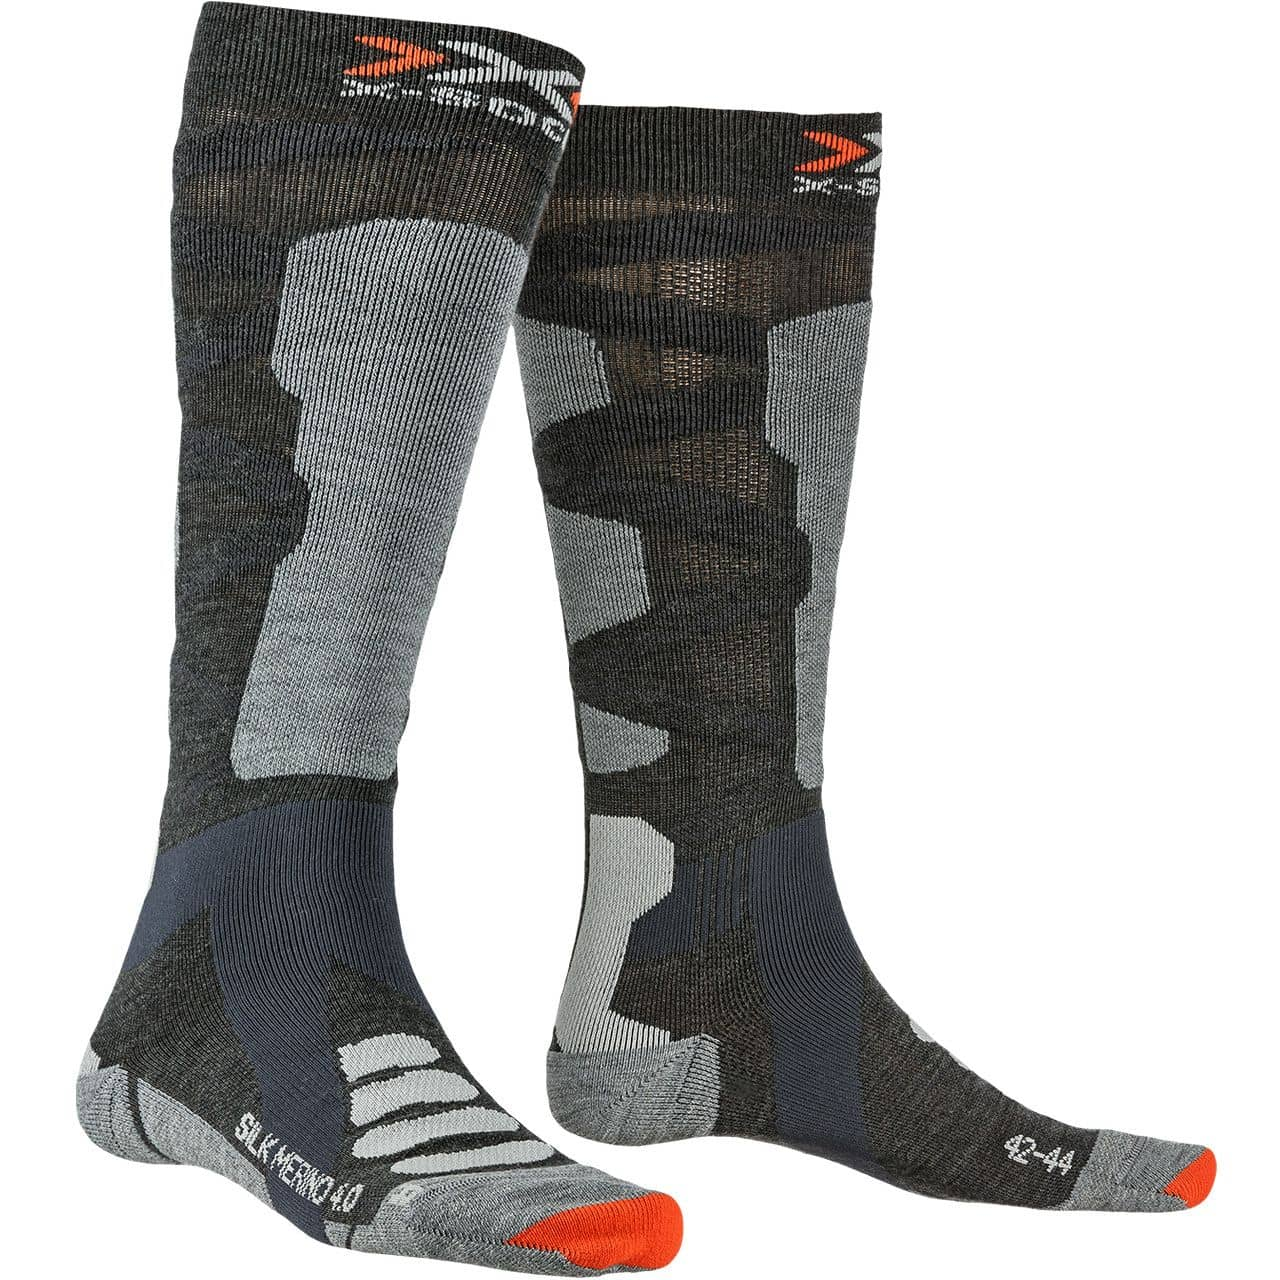 X-Socks Men SILK MERINO anthracite - 42-44